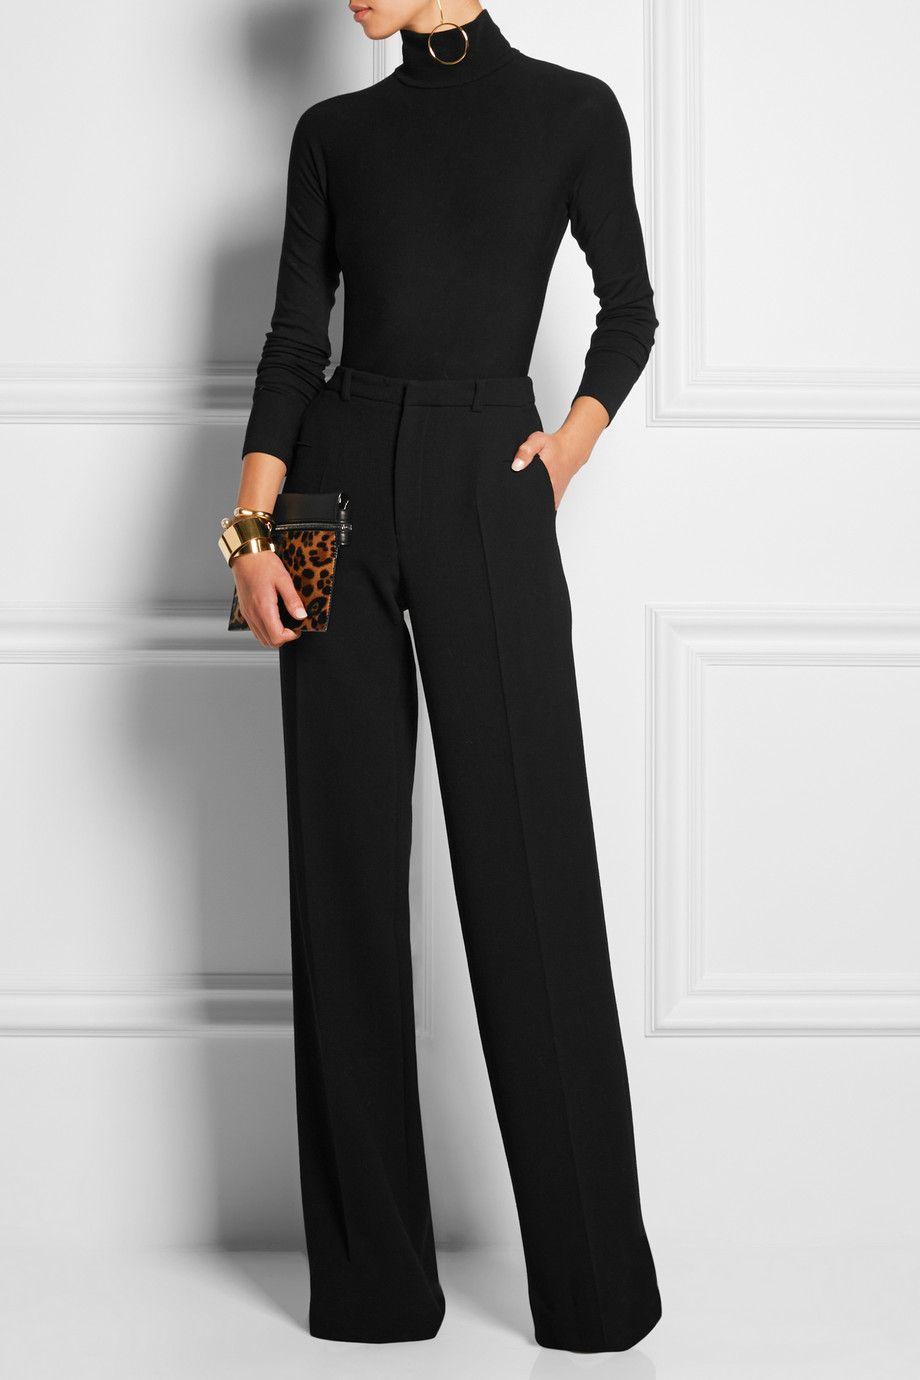 Donna Karan New York|Stretch-jersey turtleneck bodysuit|NET-A-PORTER.COM -   24 new york outfits ideas